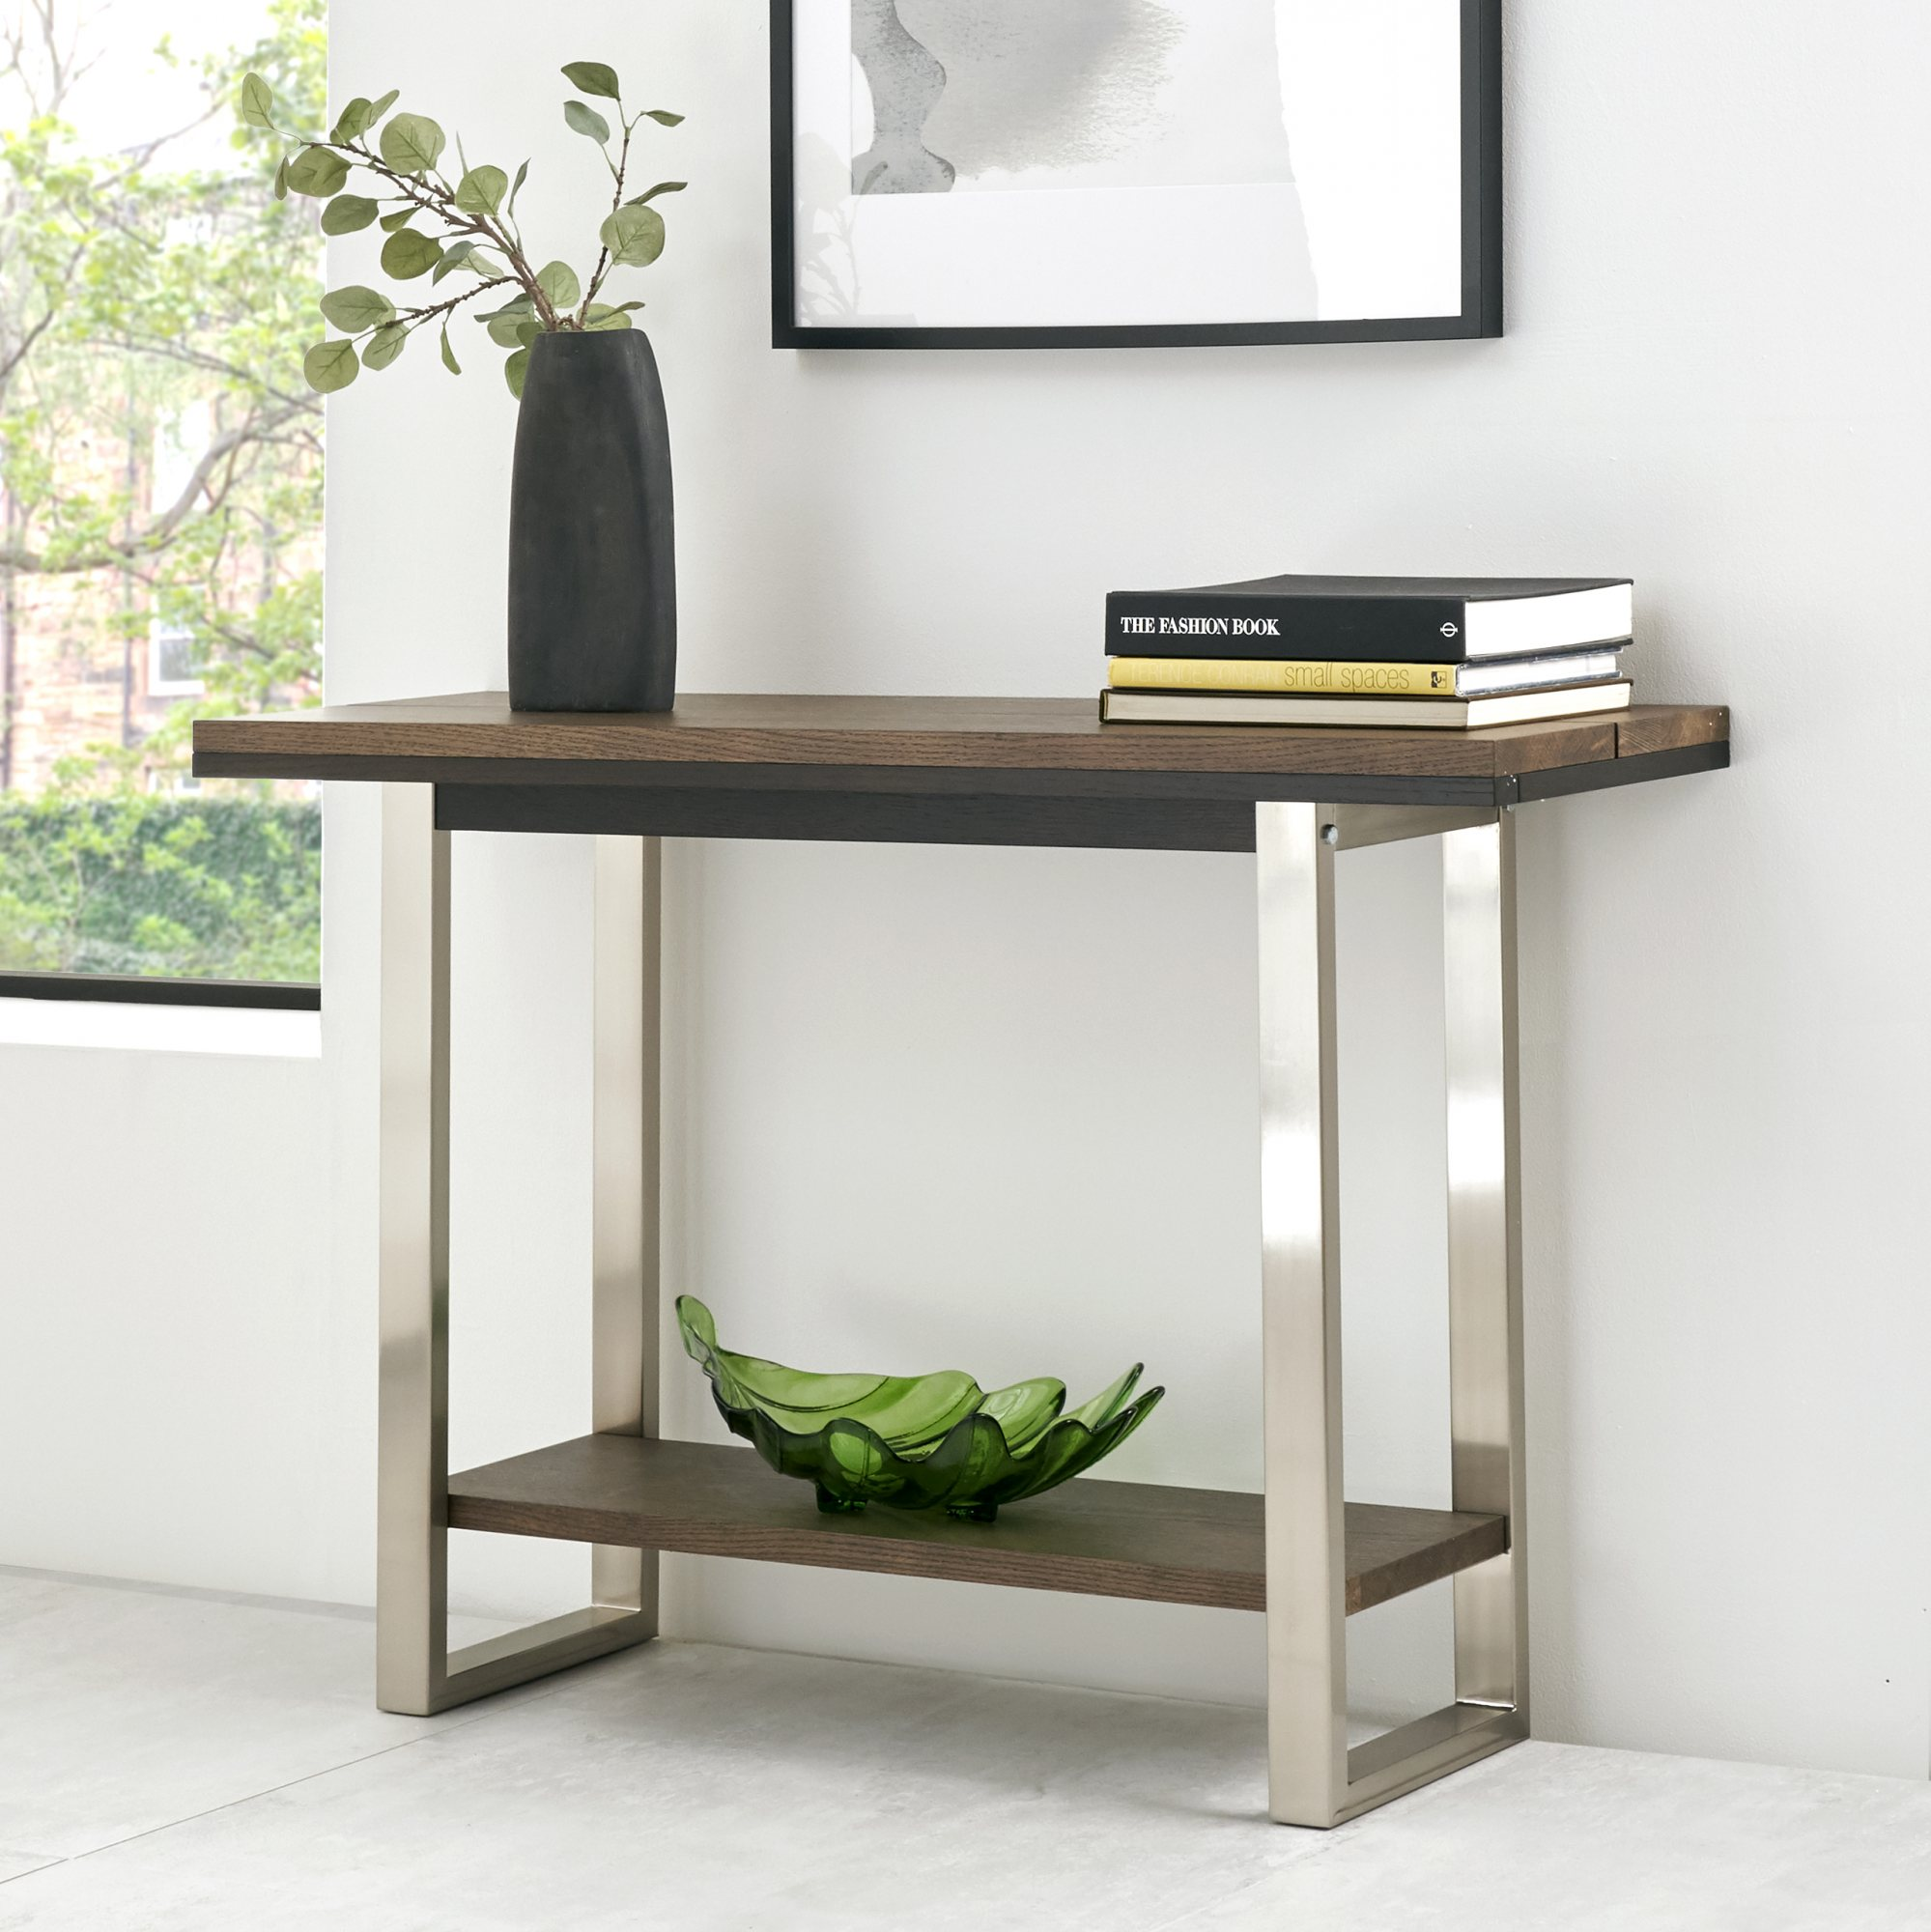 BRINDISI CONSOLE TABLE - L112cm x D37cm x H77cm